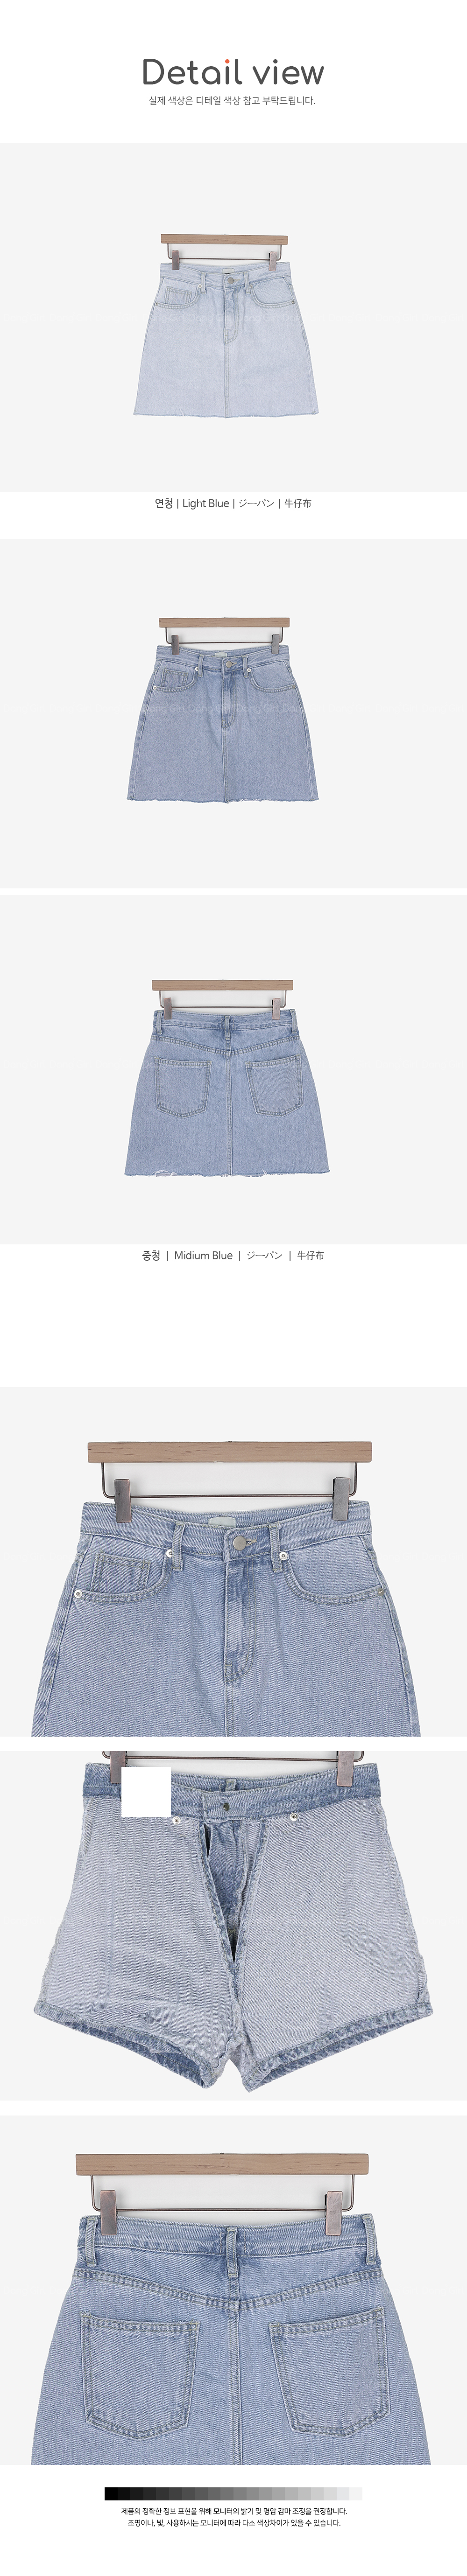 Big Size 26-38 Inch Lemedi Denim Mini Skirt